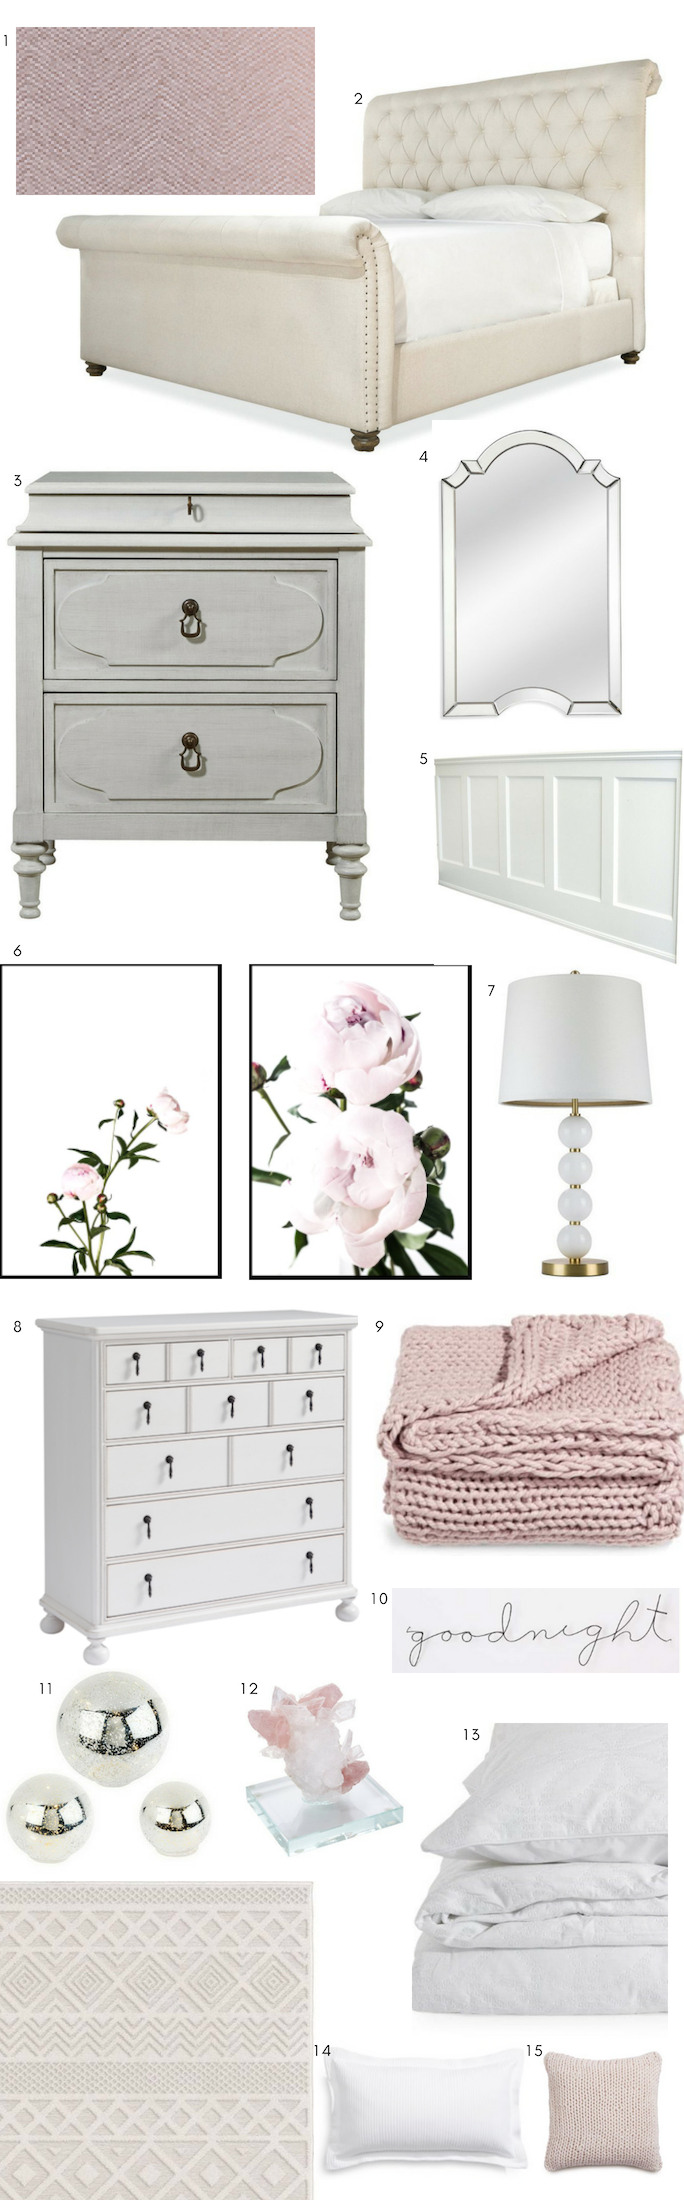 Master Bedroom Design Boards Bedroom Design Board Chandeliers And Champagne